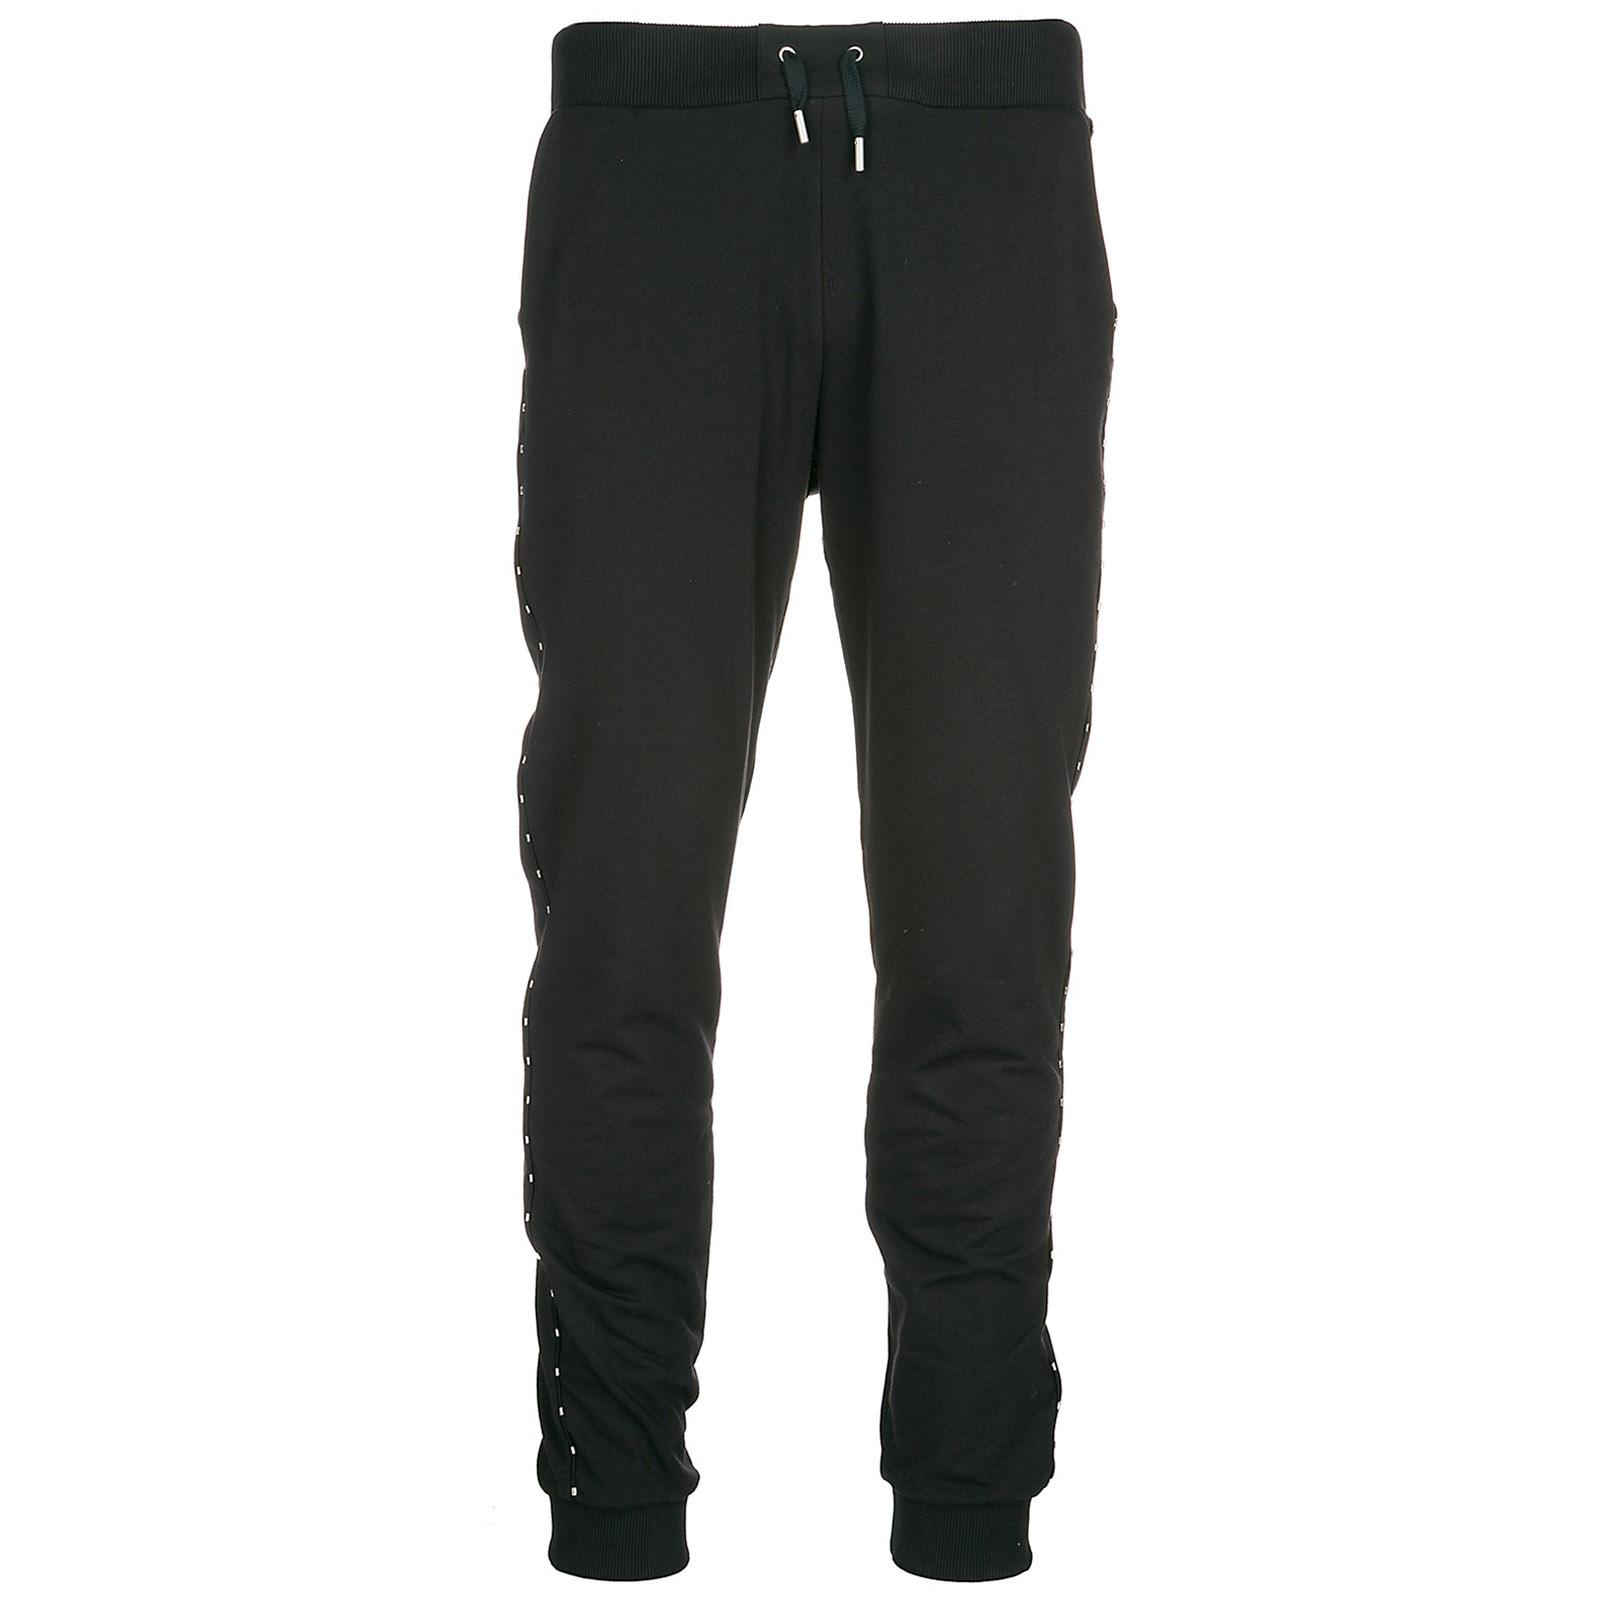 Pantaloni tuta uomo fleece light stretch